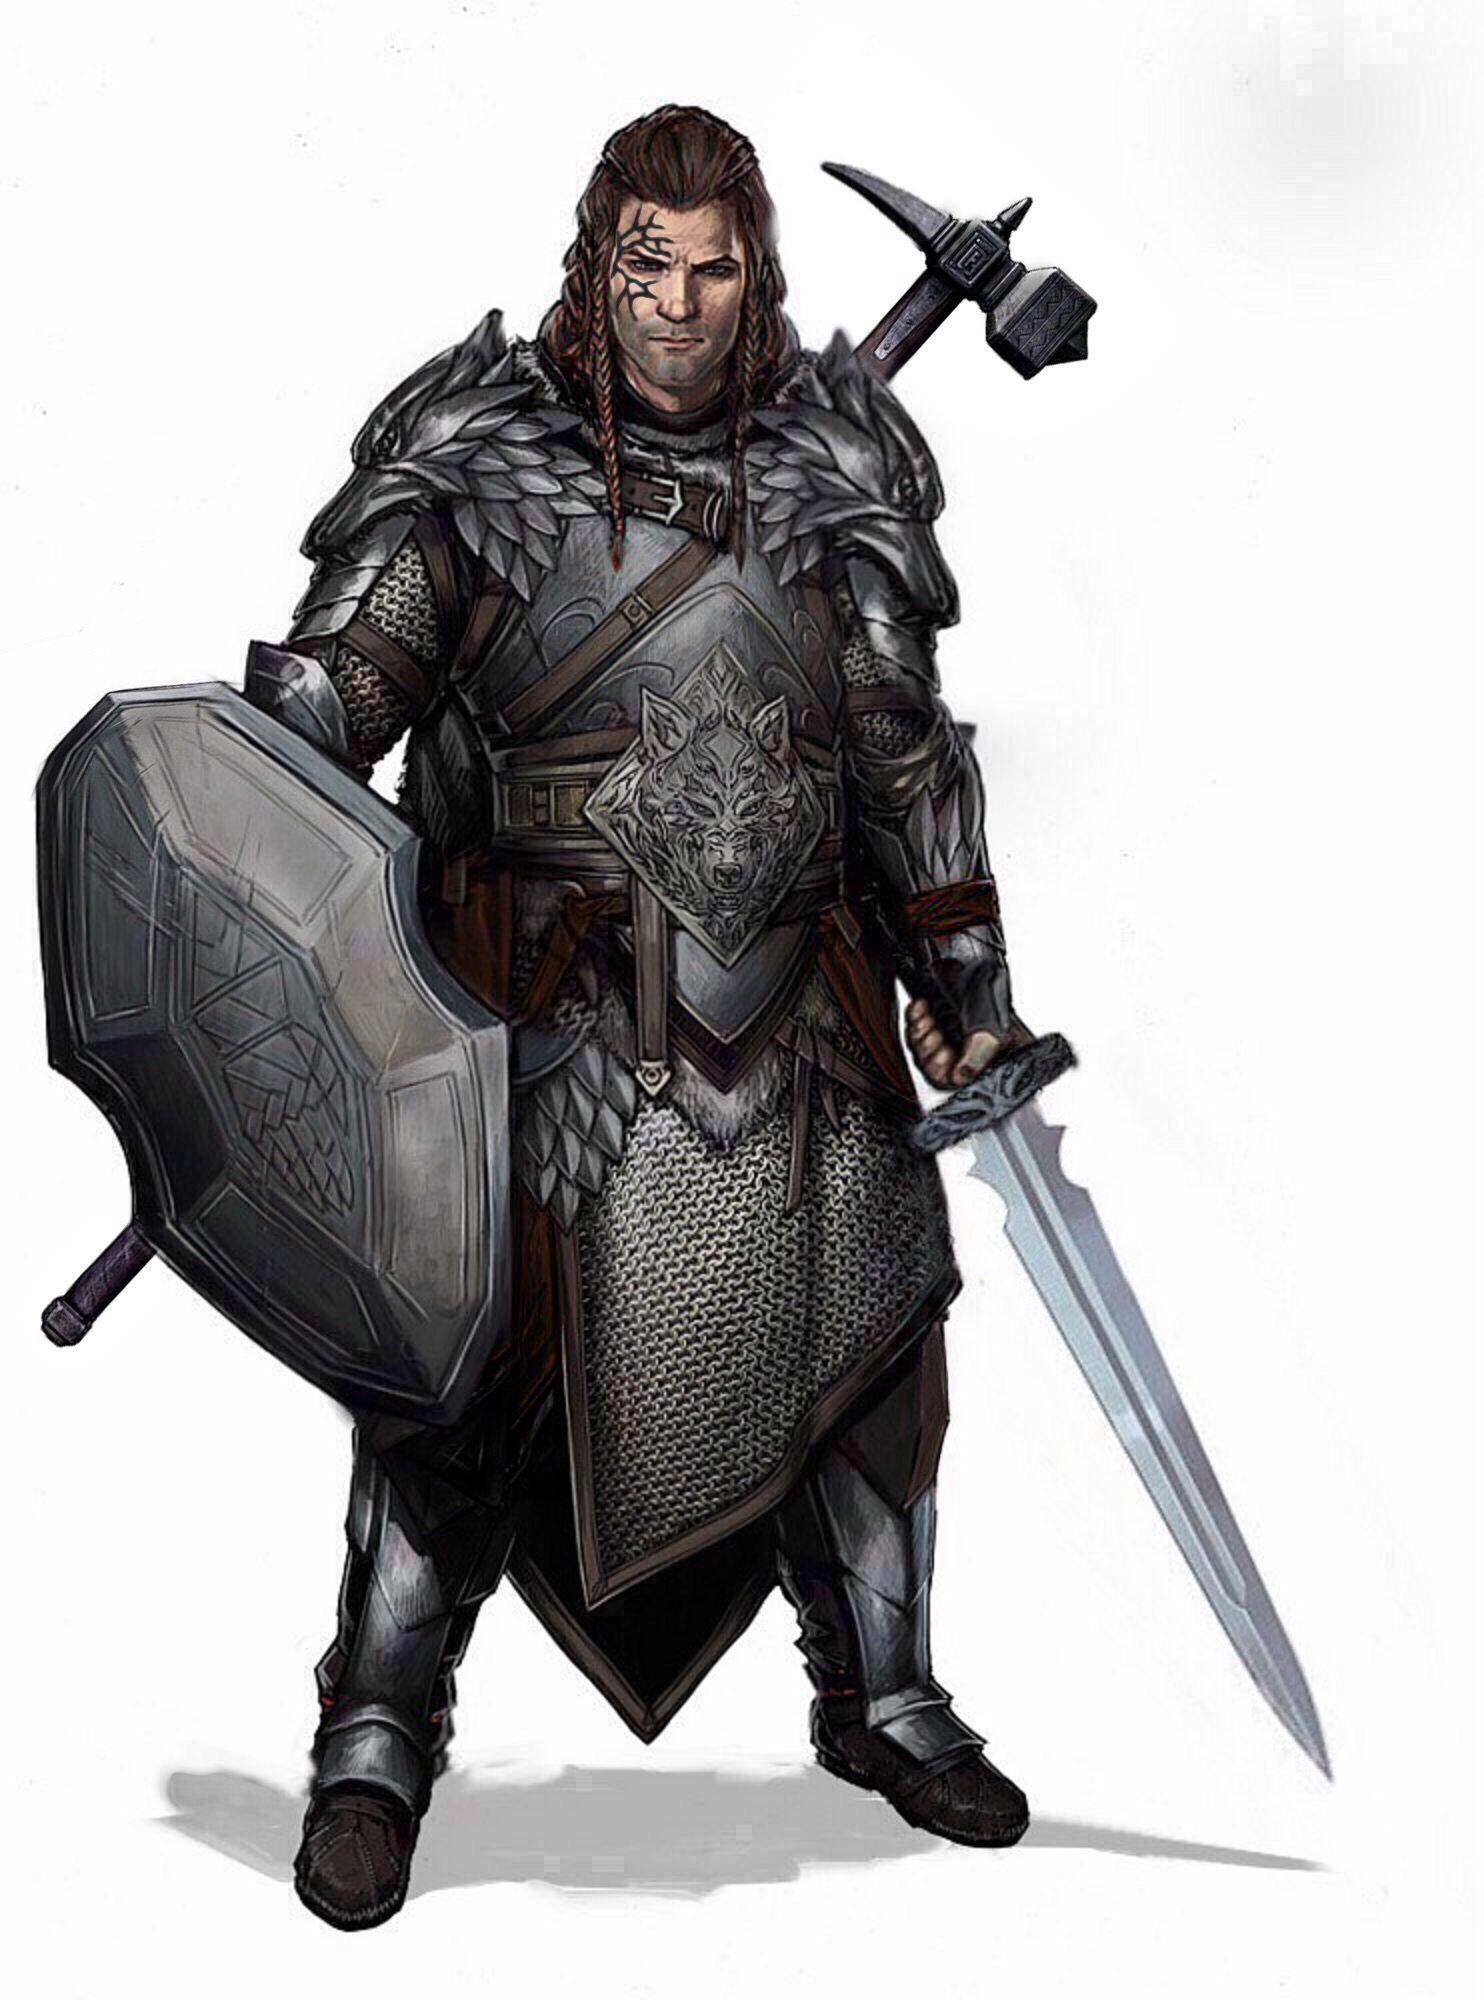 m Paladin Plate Shield Sword War Hammer midlvl | Dungeons and dragons characters, Fantasy ...